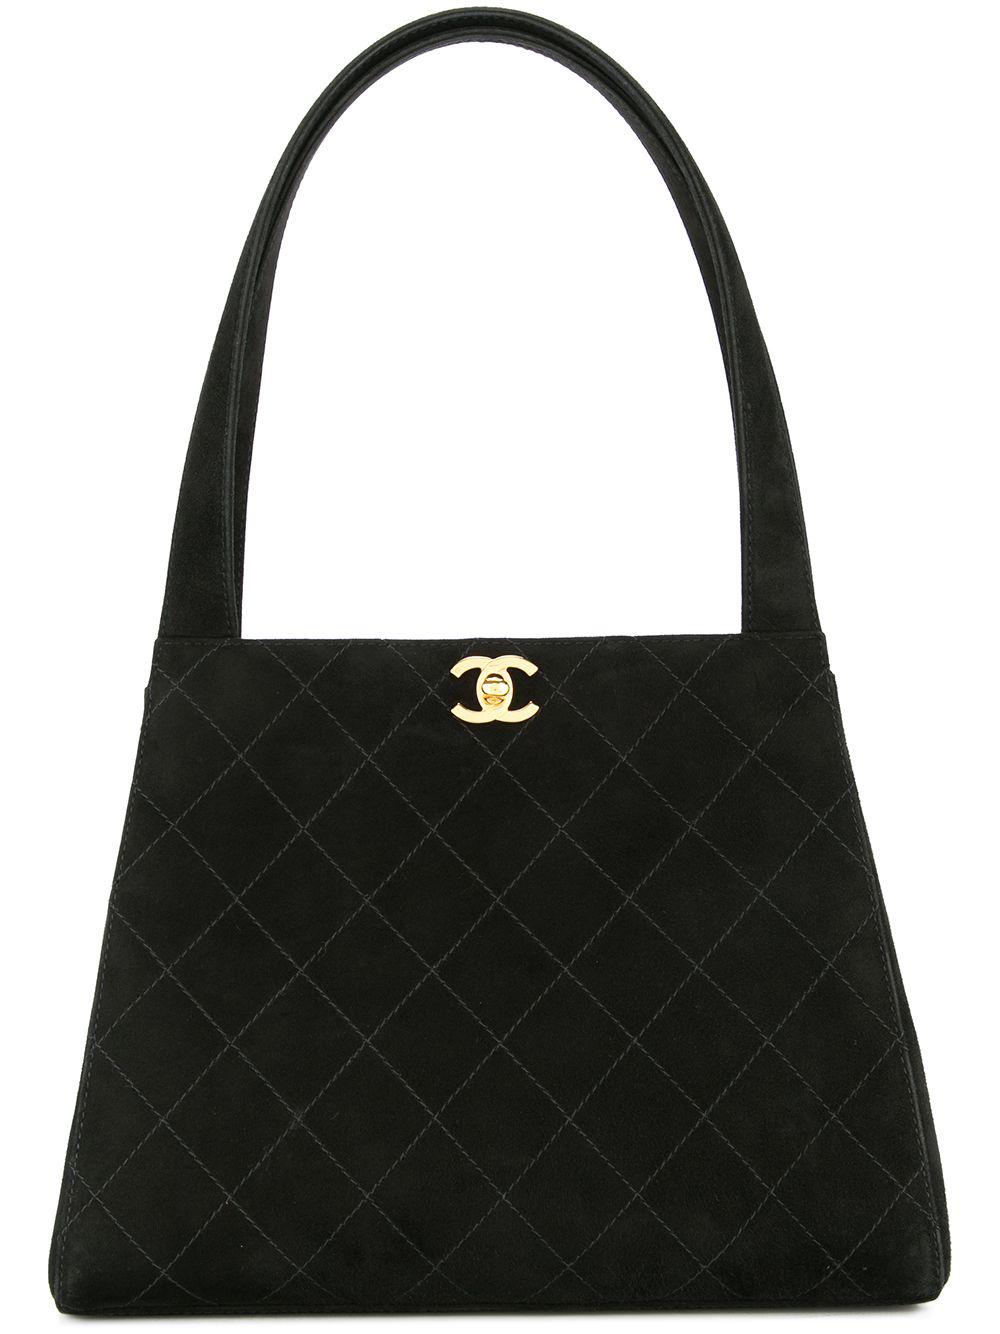 33d903680537 Chanel Pre-Owned Cc Logos Shoulder Bag - Black | ModeSens